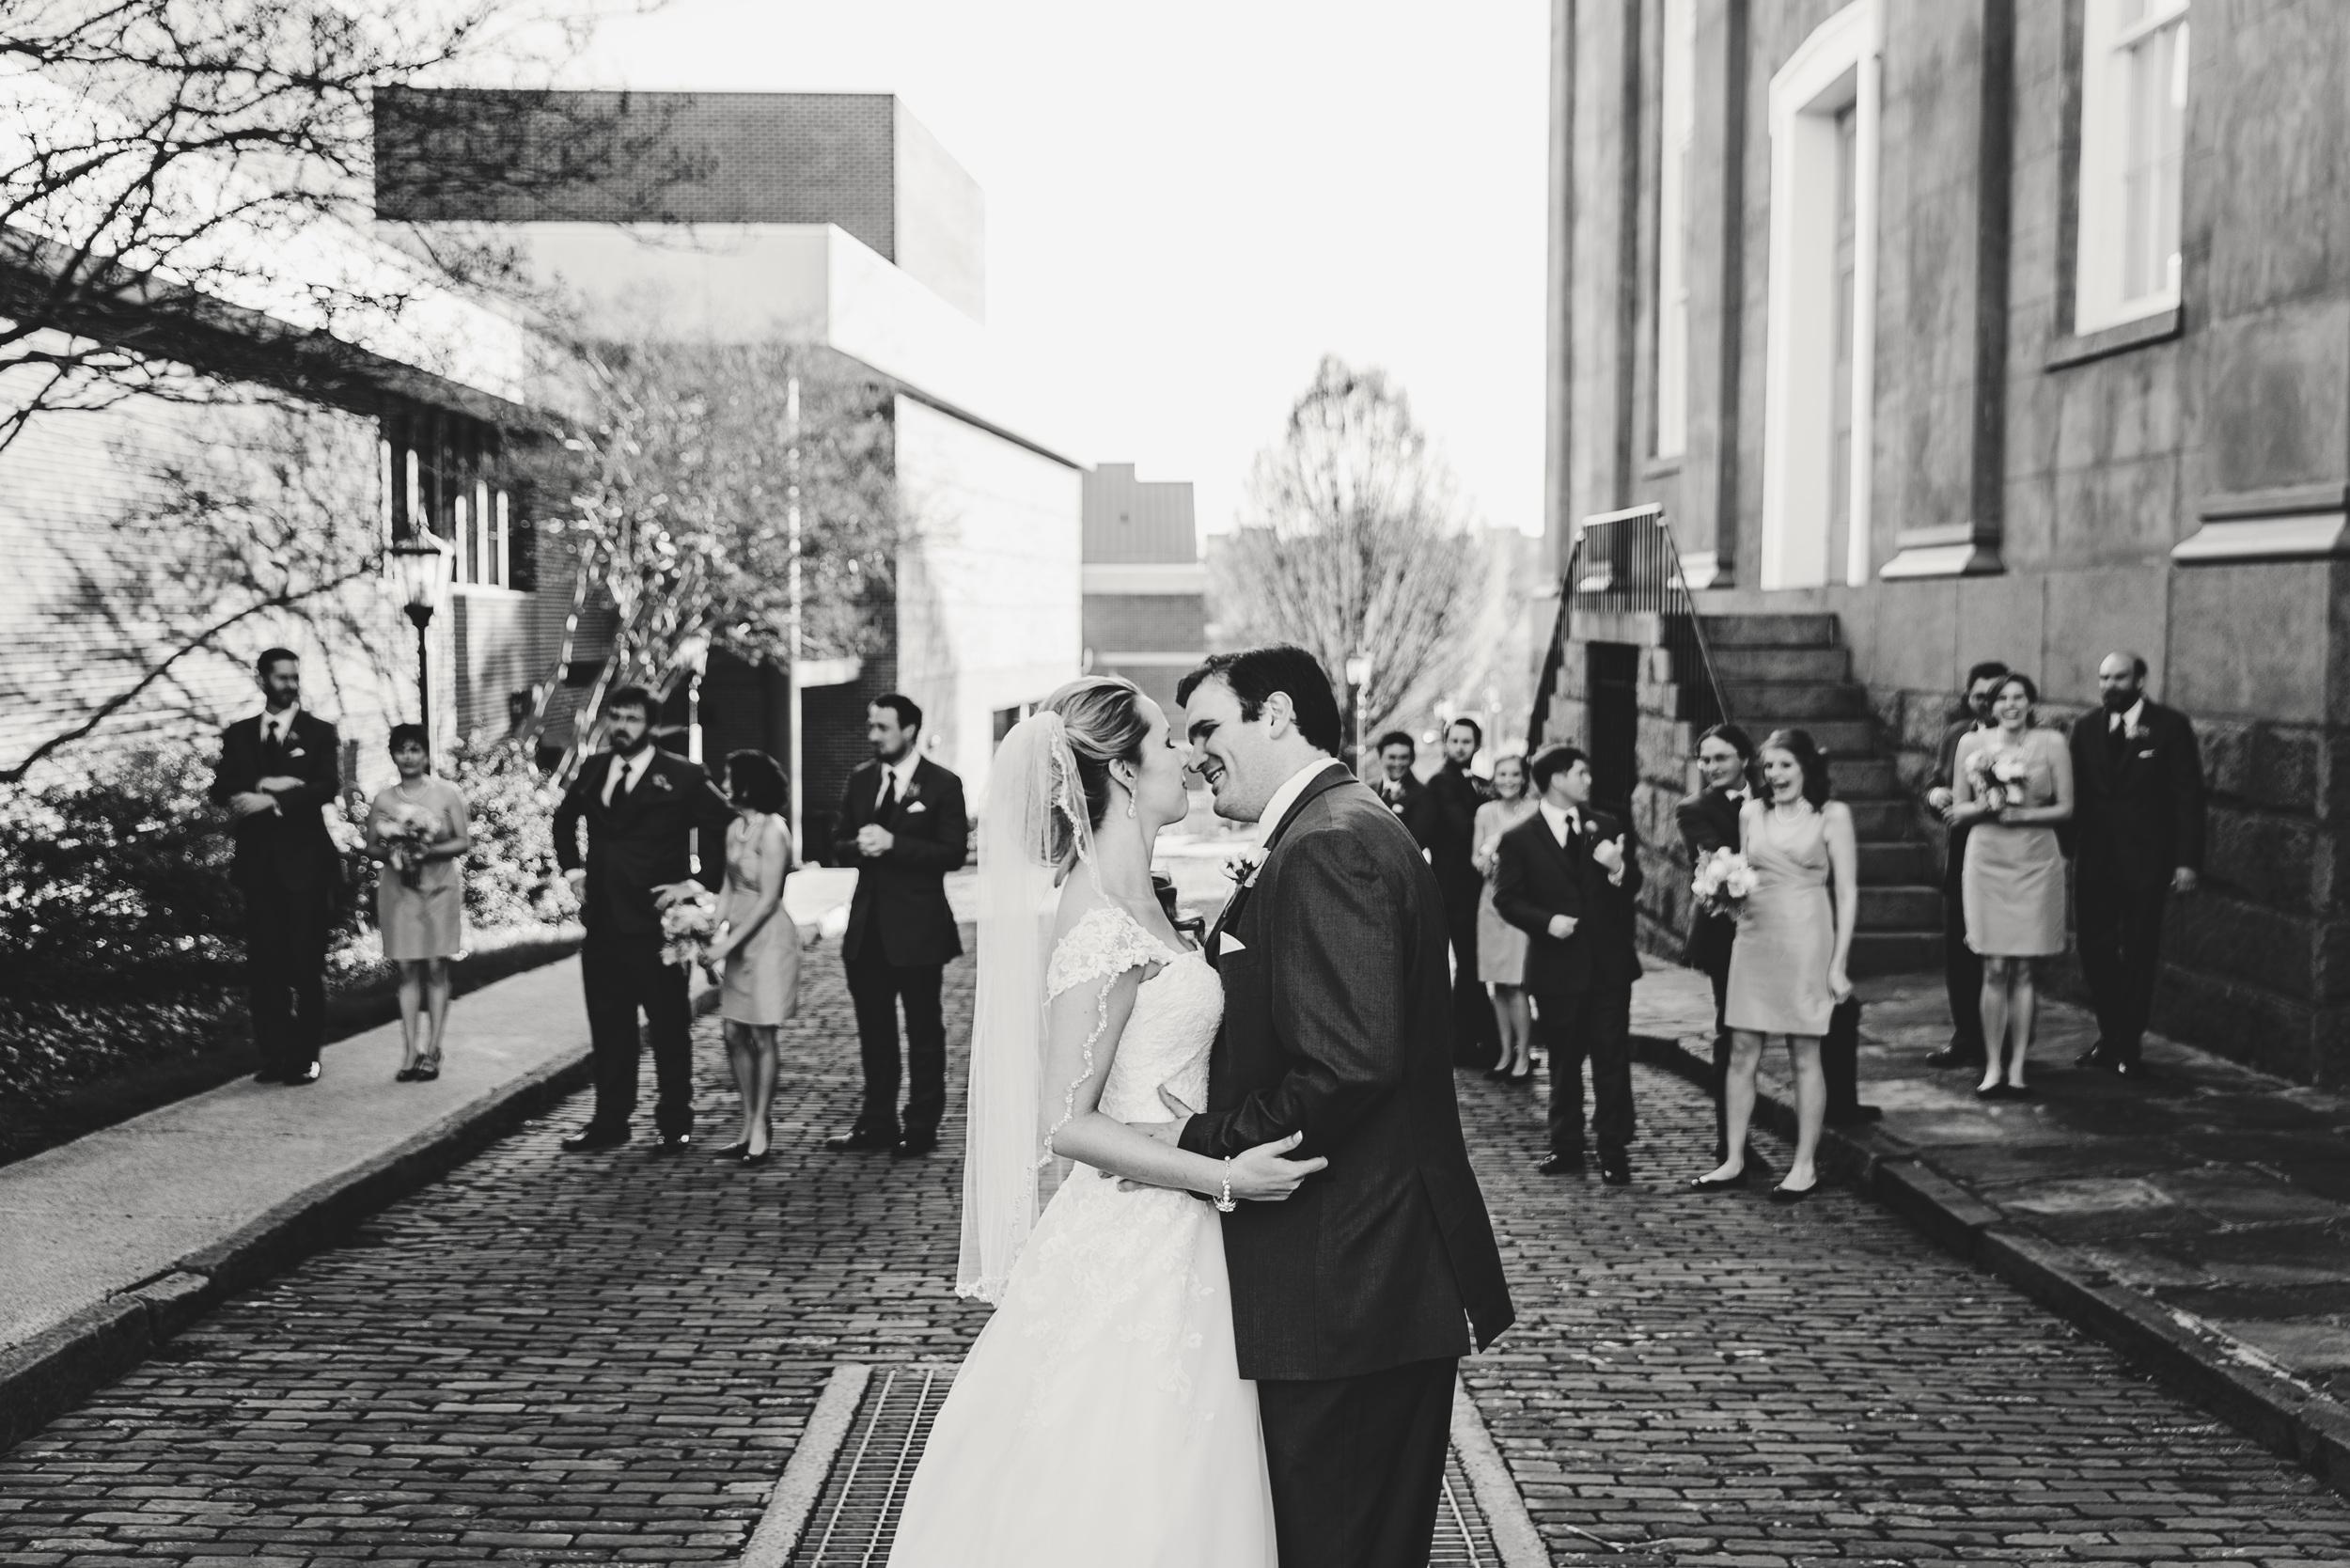 tresca_elegant_downtown_wedding_lynchburg_va026.jpg